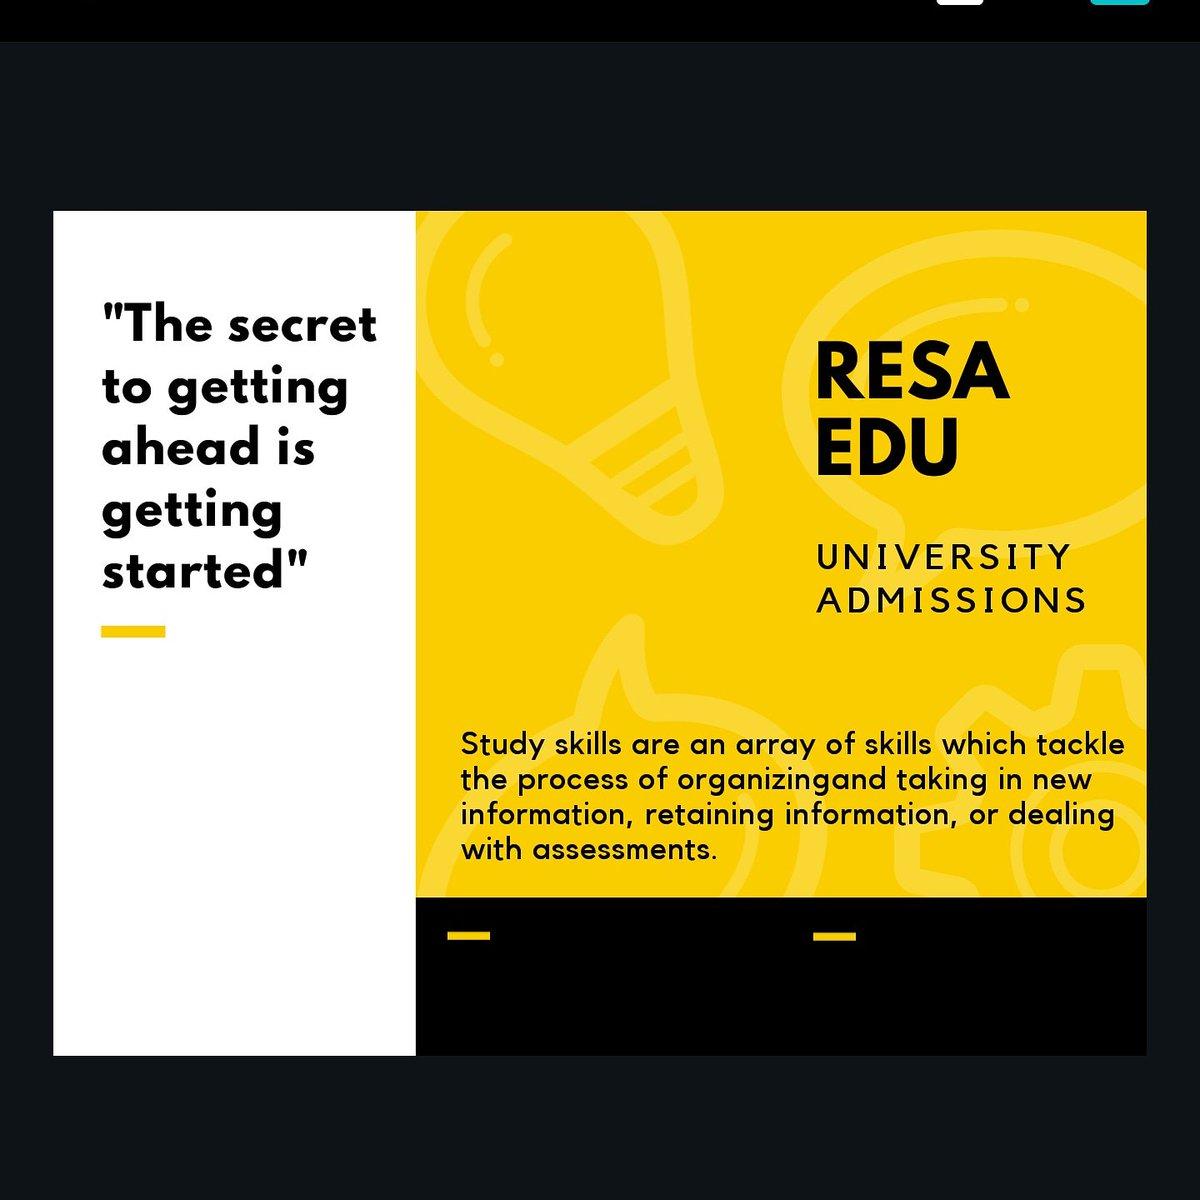 Get started on your educational journey! #No #ApplicationFees. Contact us more for #PartialScholarships.    #البحرين #السعودية #قطر #الامارات #الكويت #اليمن #عمان #لبنان #الاردن #سوريا #العراق #مصر  #عمانيون_في_امريكا